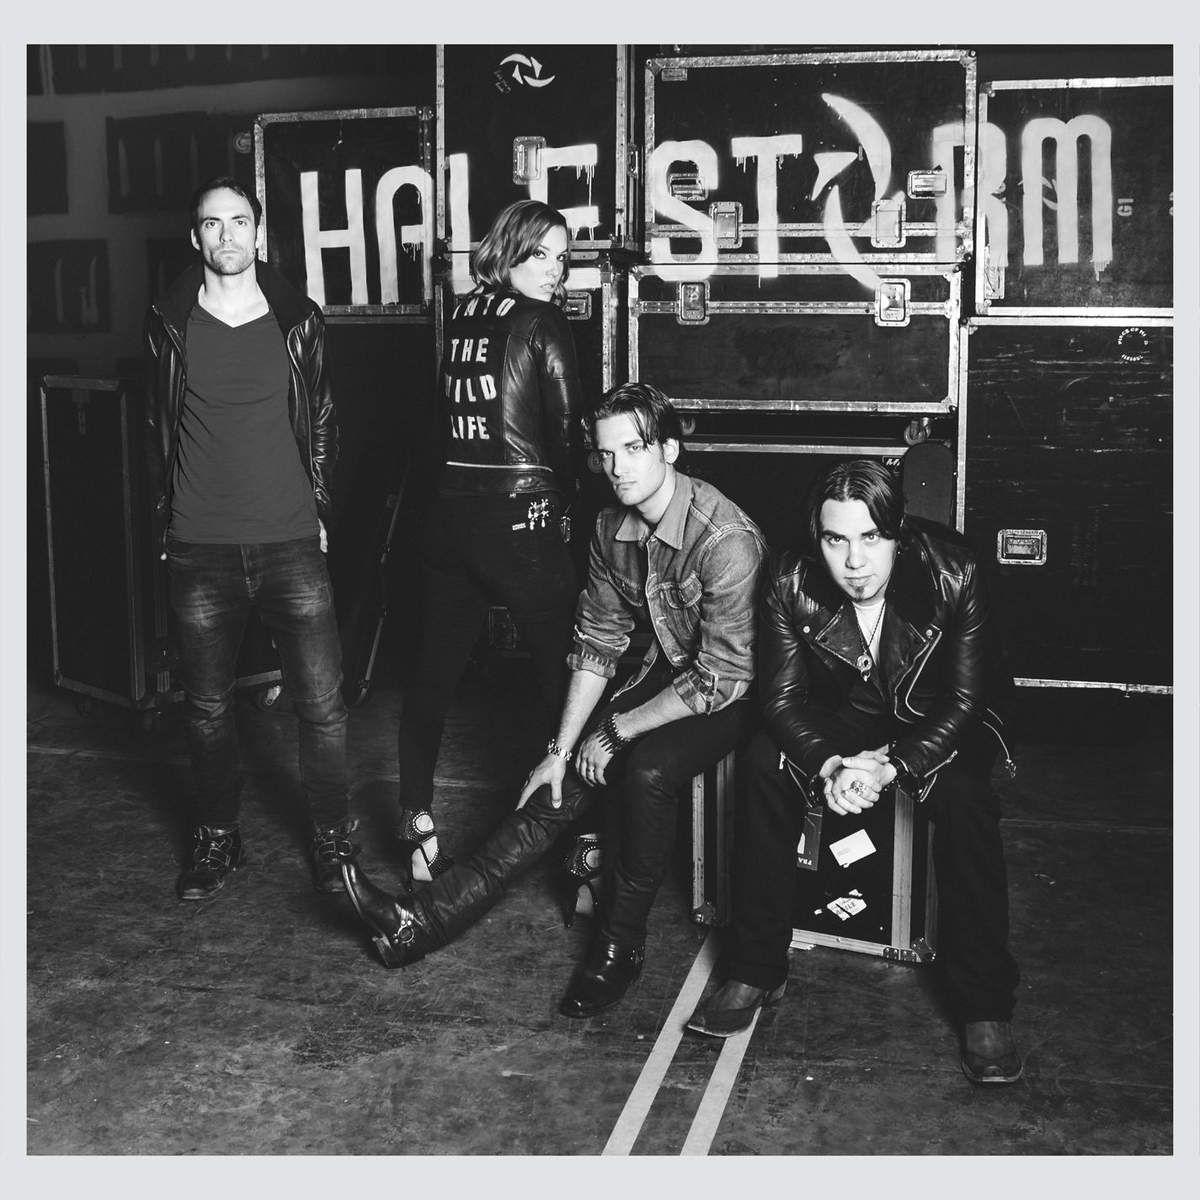 Halestorm - Into The Wild Life album cover